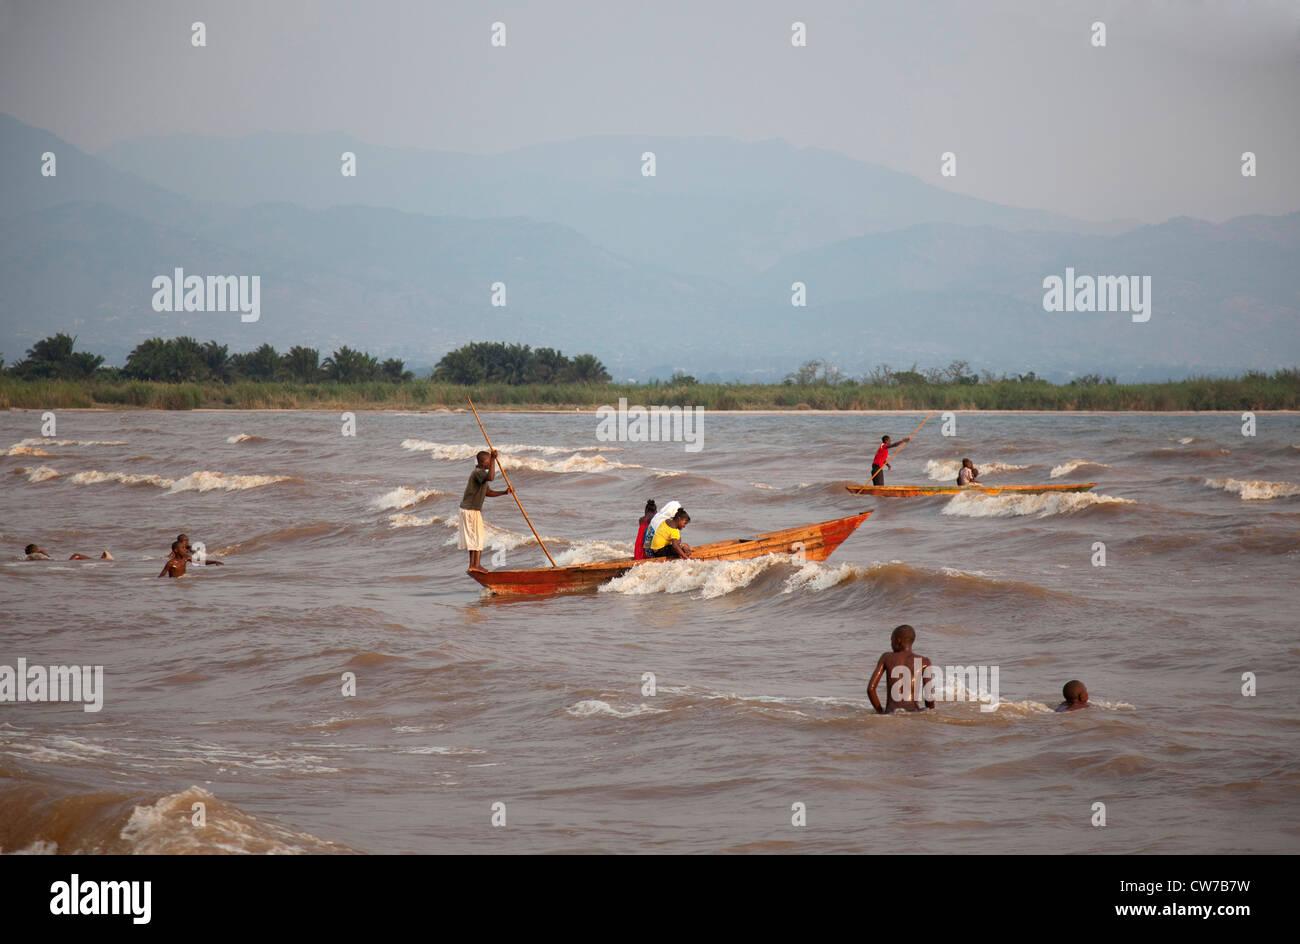 children swimming and boating in Lake Tanganyika, Burundi, Bujumbura Mairie, Bujumbura - Stock Image